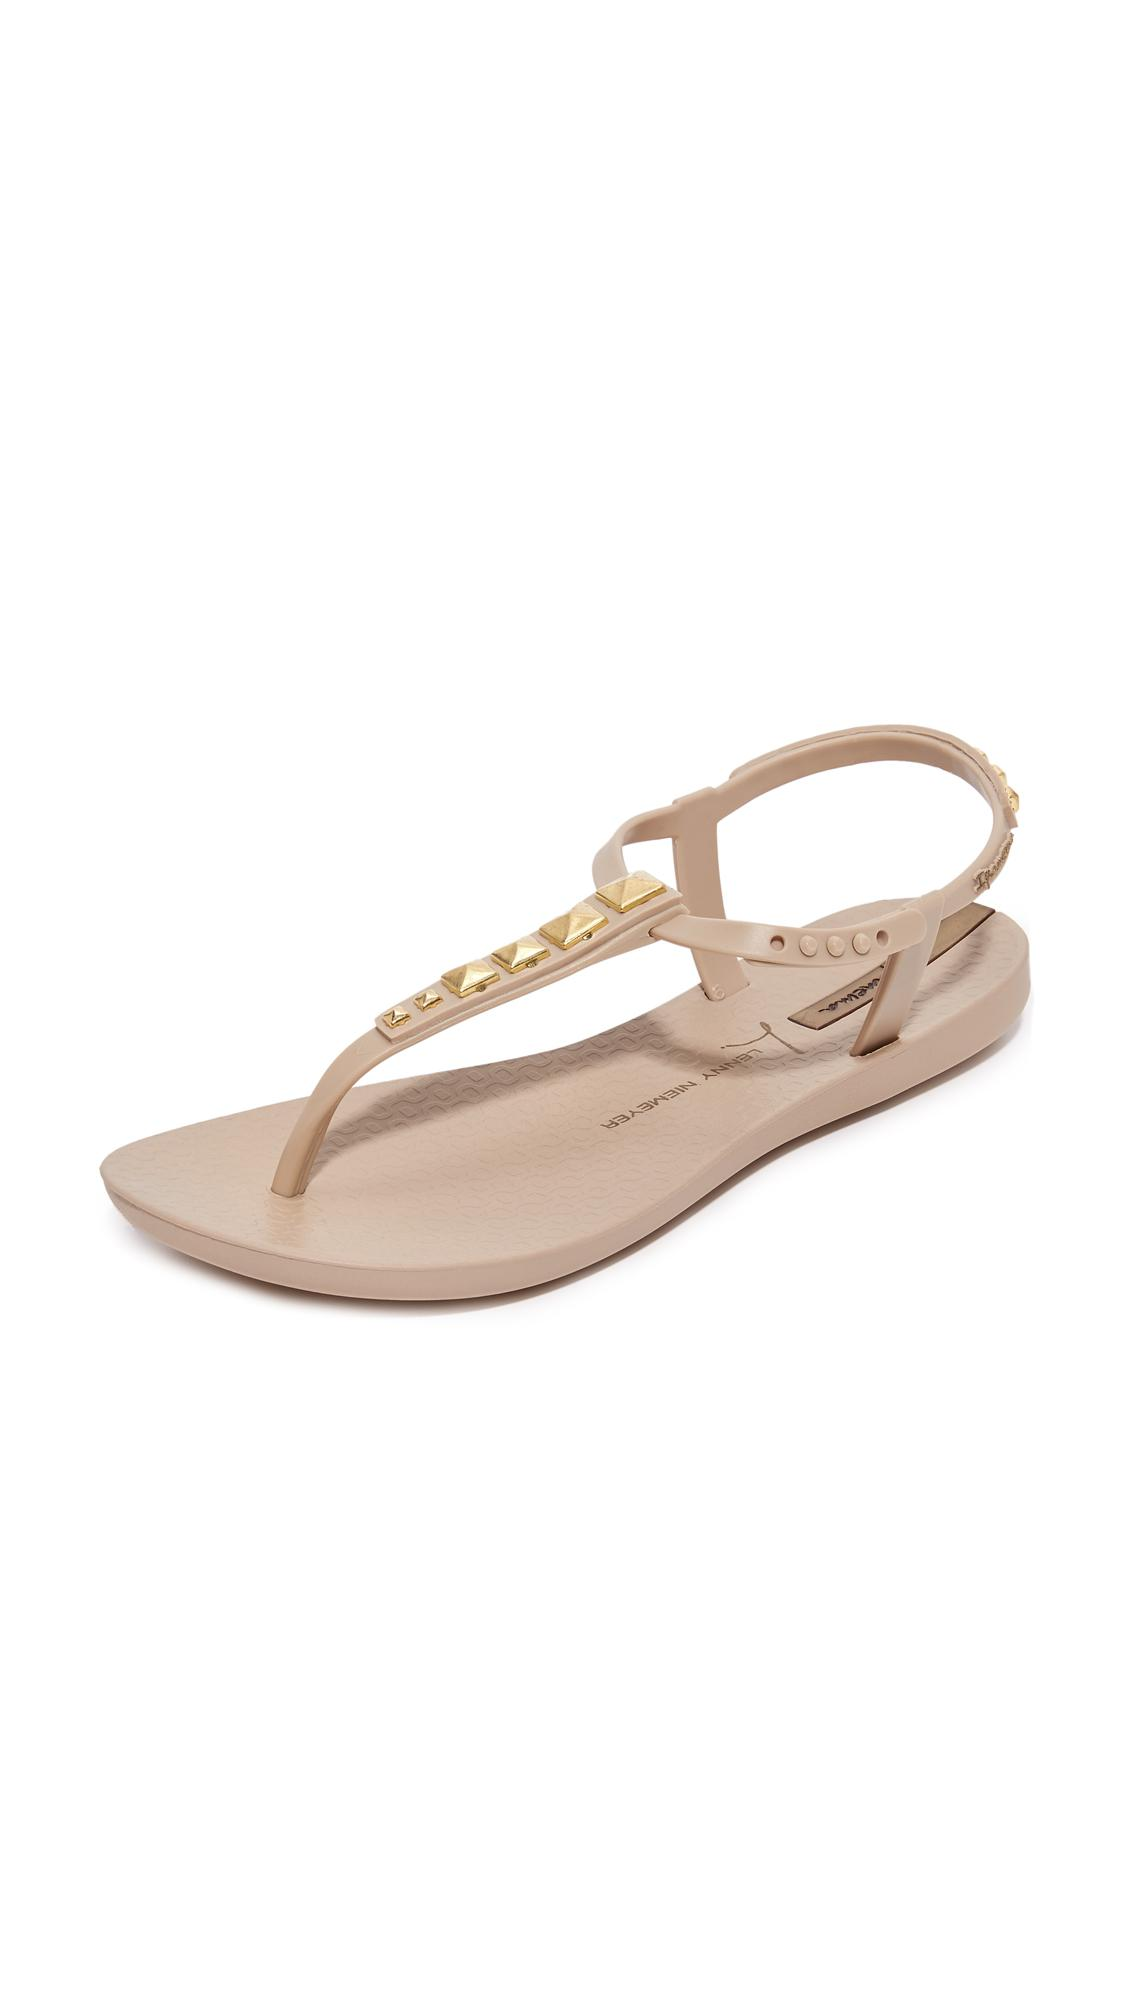 e9993594c5e2 Lyst - Ipanema Premium Lenny Rocker Sandals in Natural